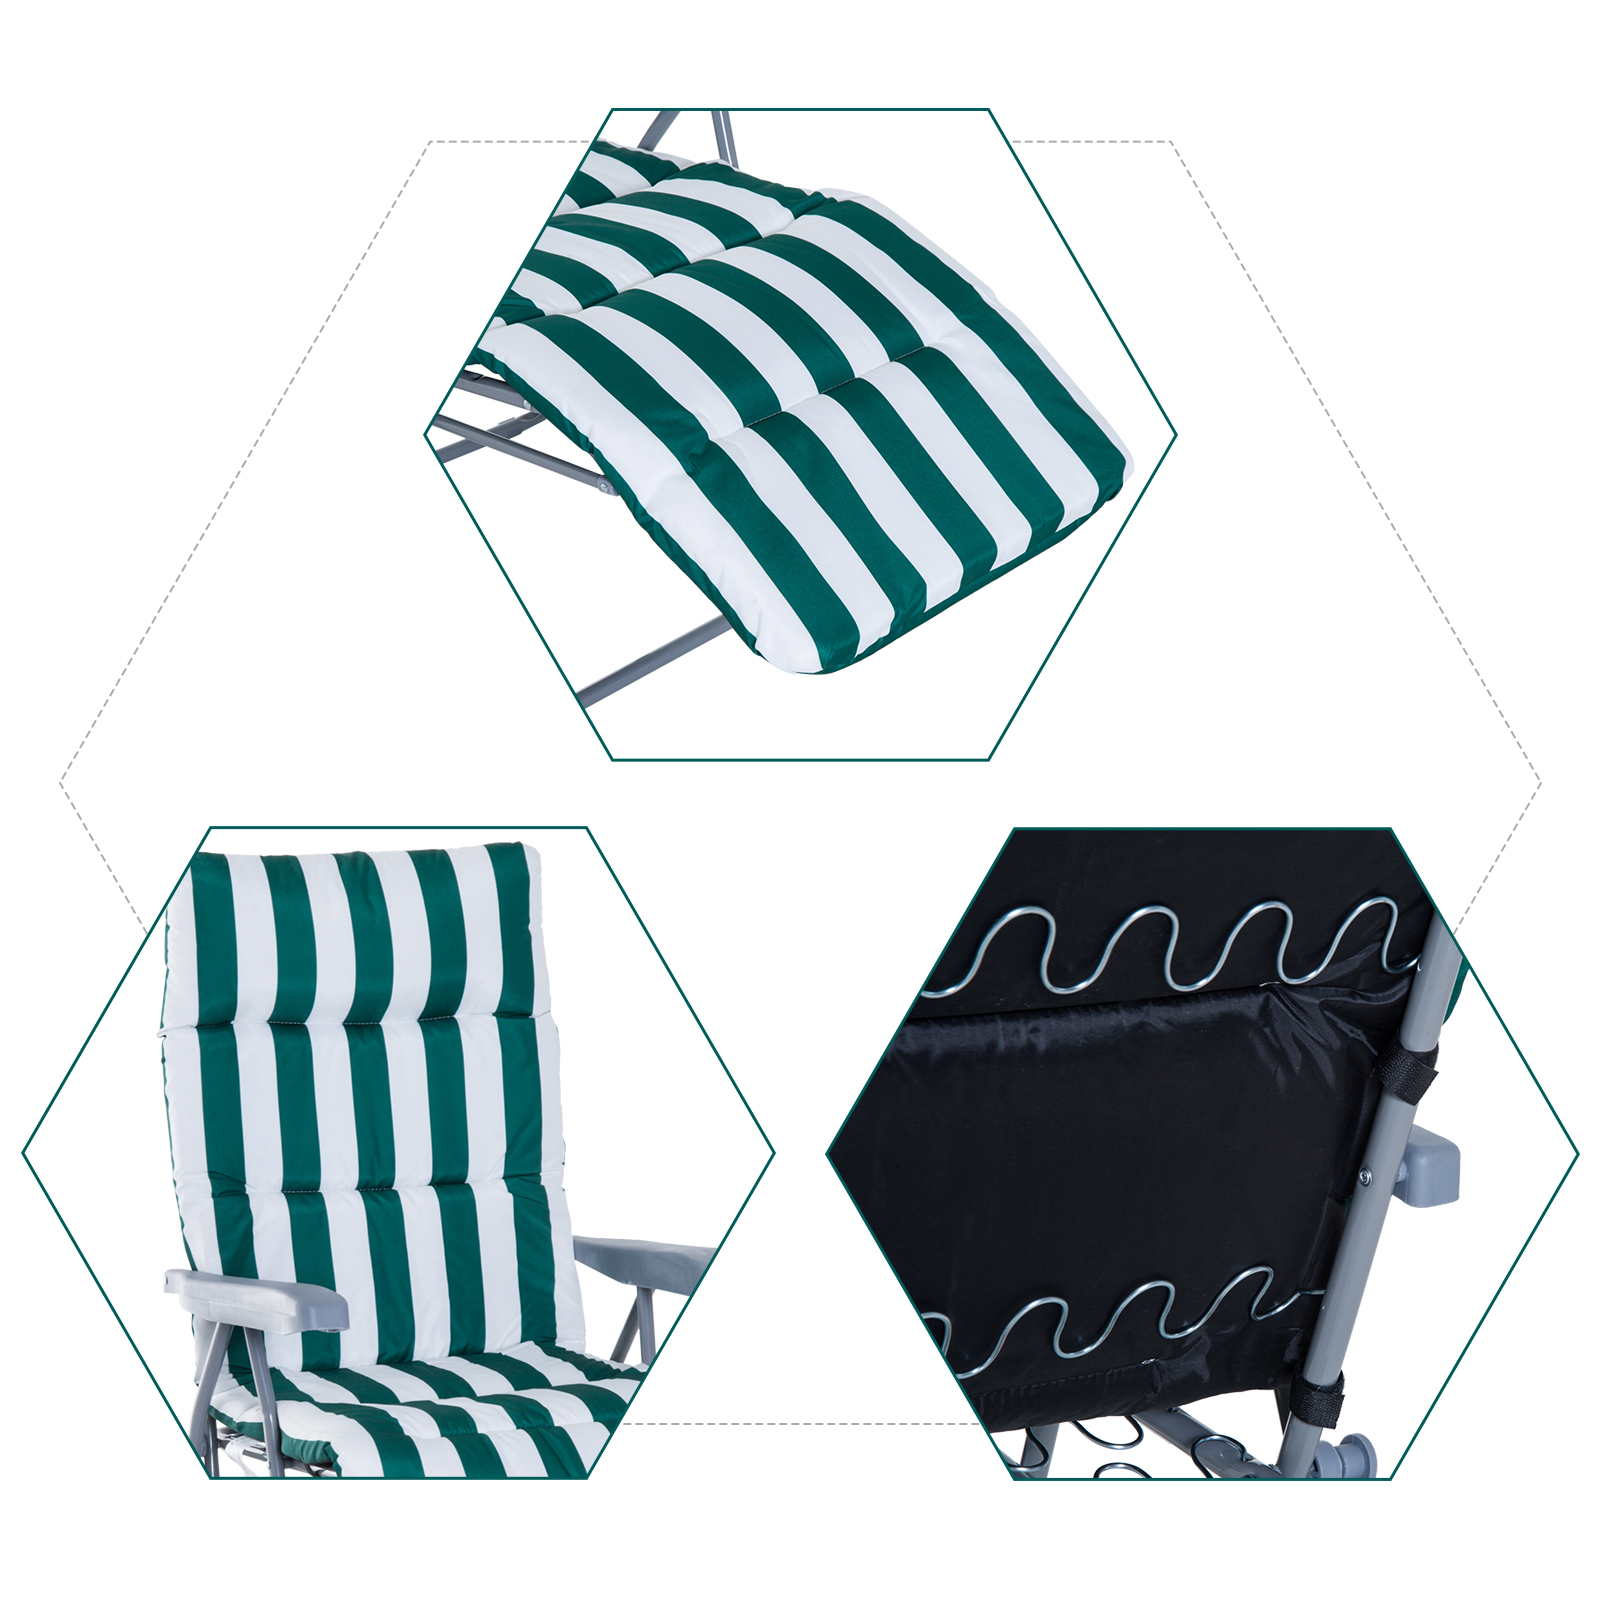 Tumbonas-2Pack-Acero-Plegable-Inclinable-Acolchado-Playa-Camping-Pack-2-Tumbonas miniatura 17